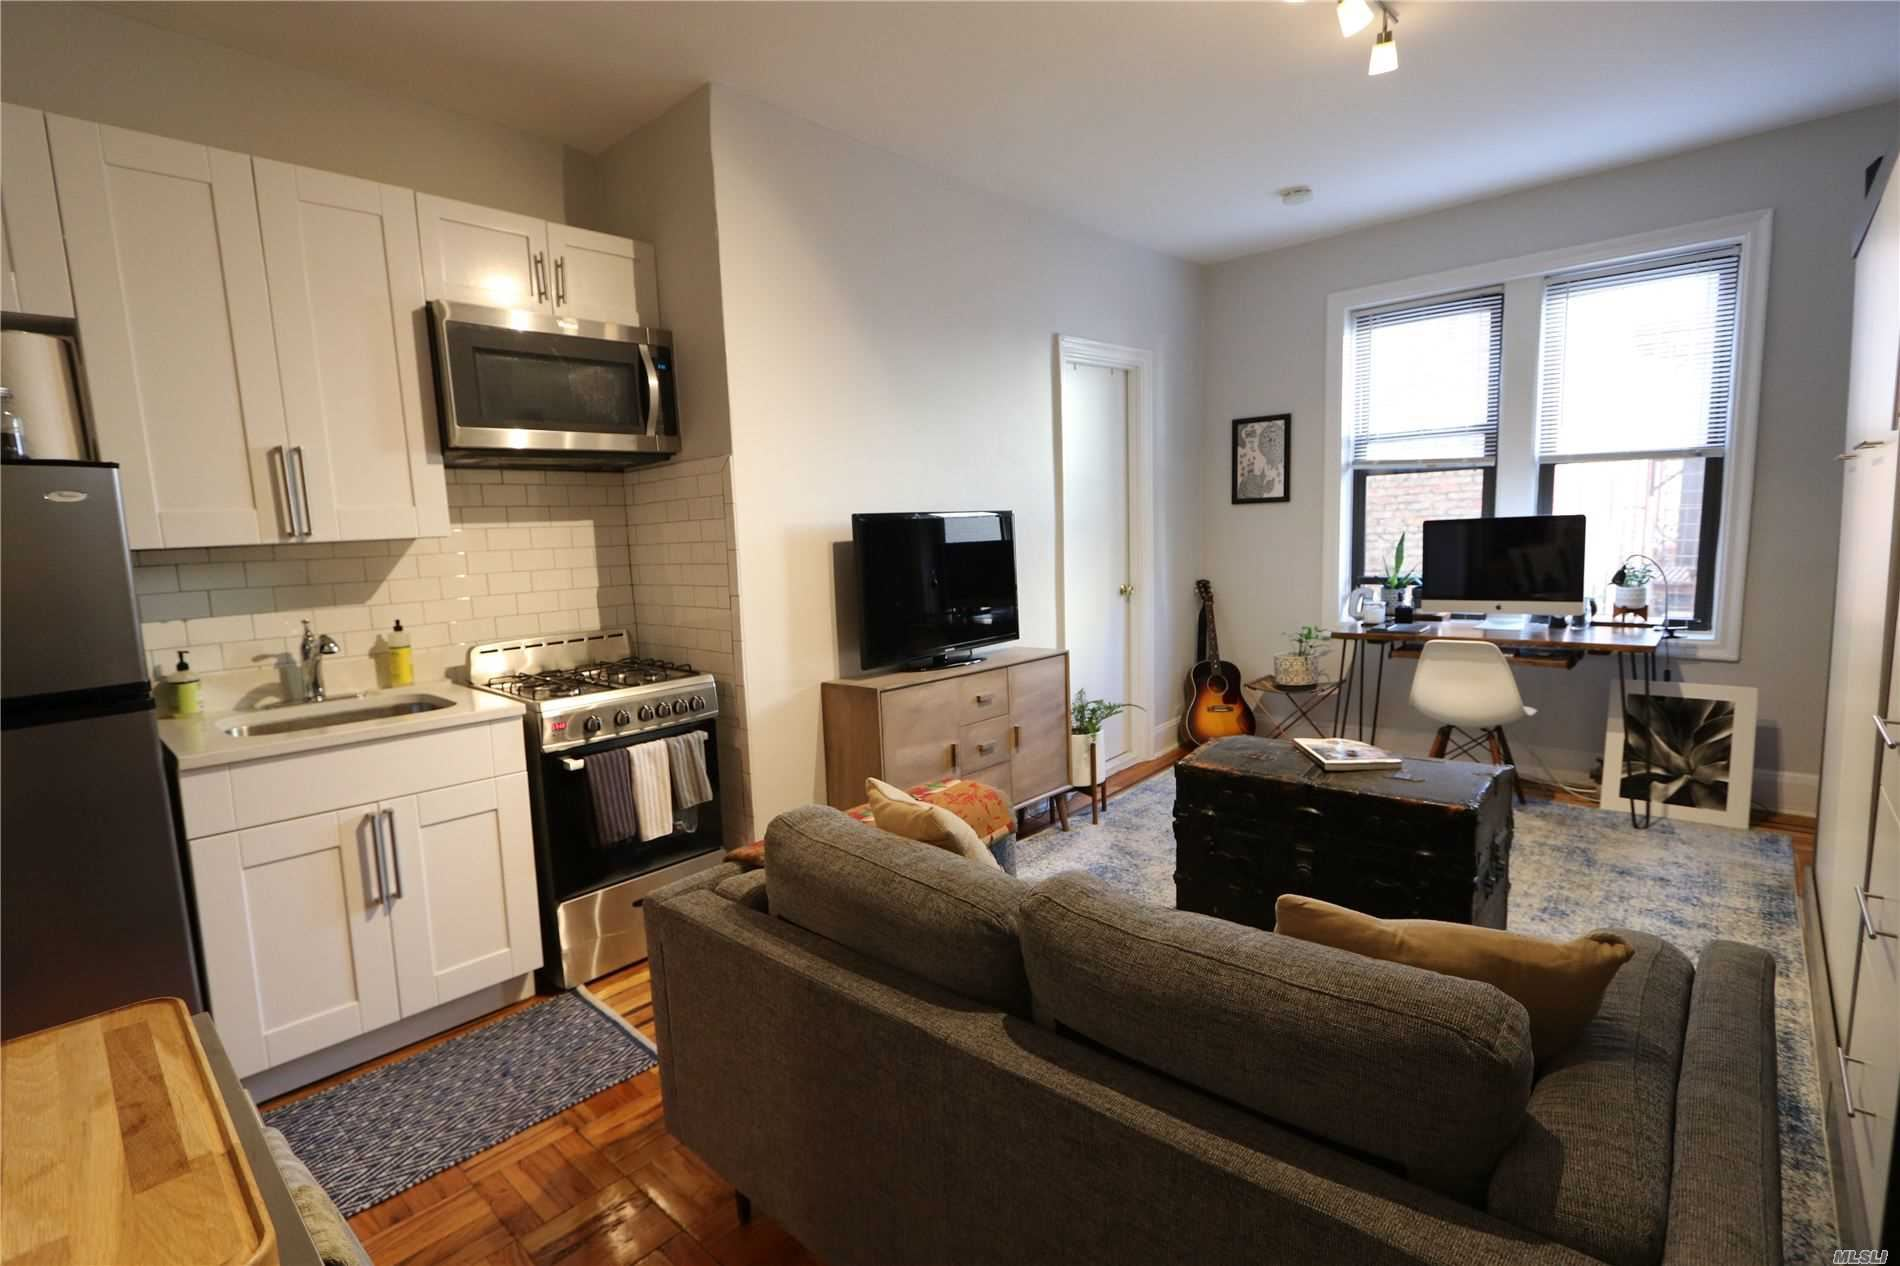 43-42 45th Street #2R, Sunnyside, NY 11104 - MLS#: 3189758